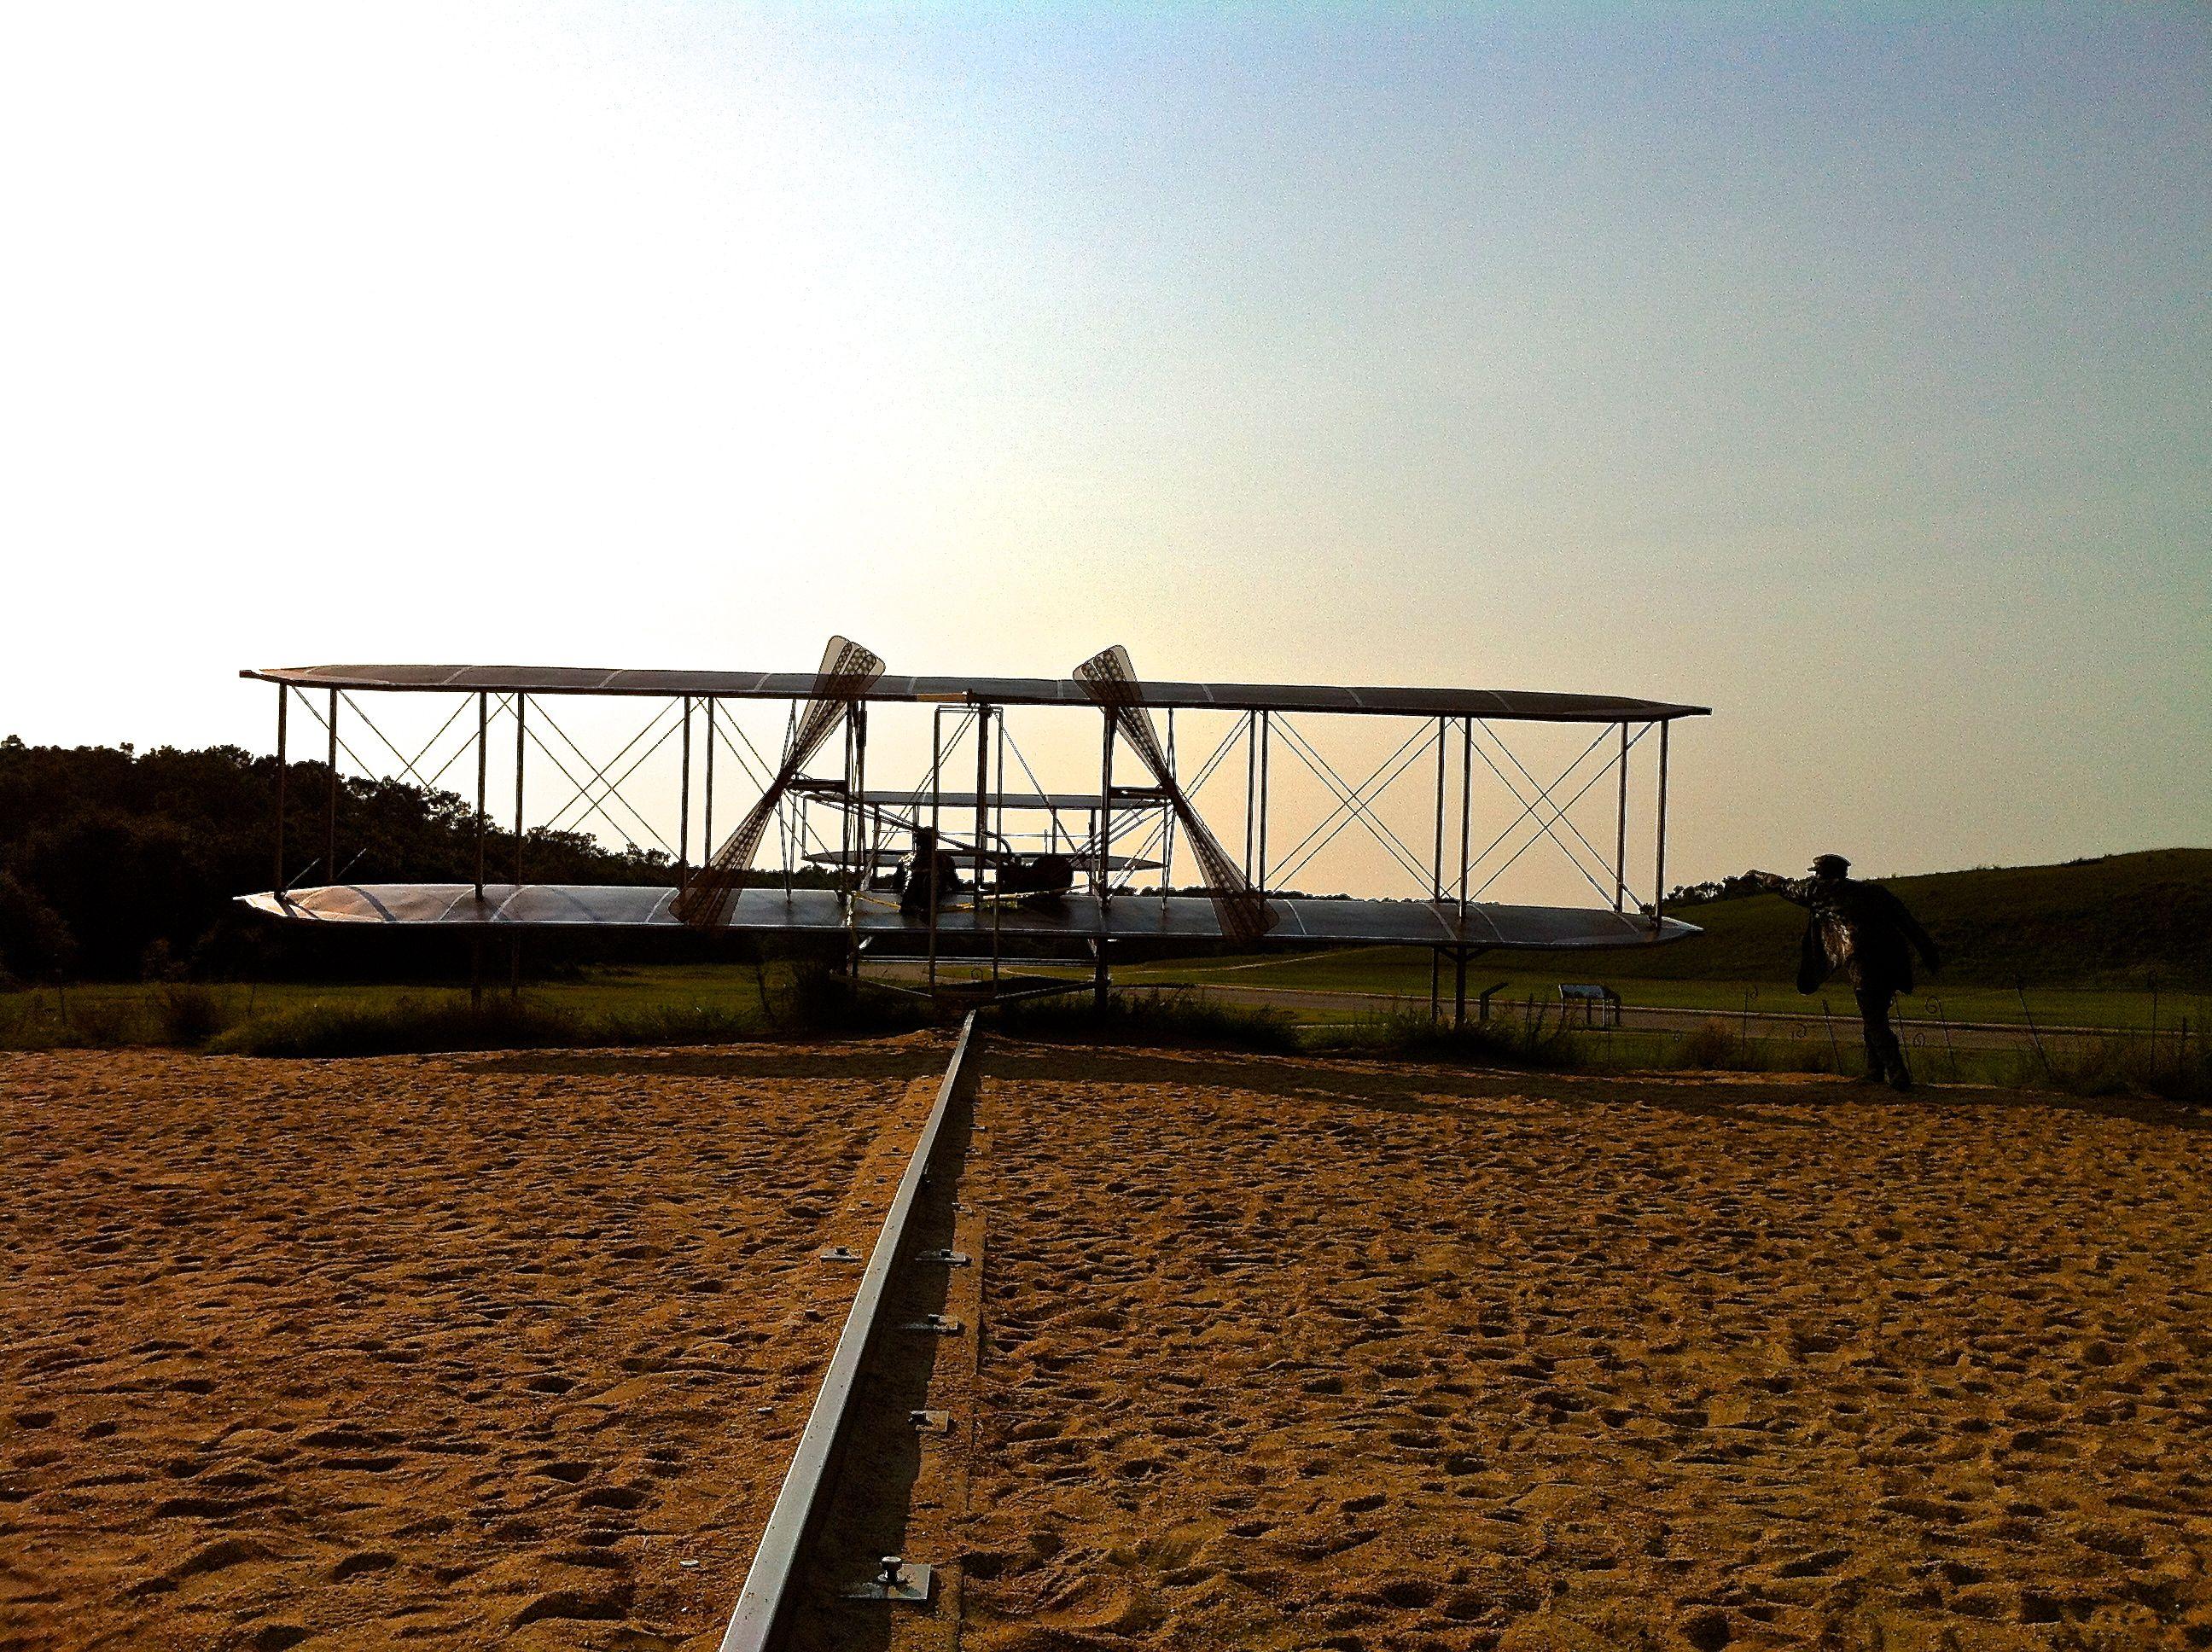 virginia beach memorial day airshow